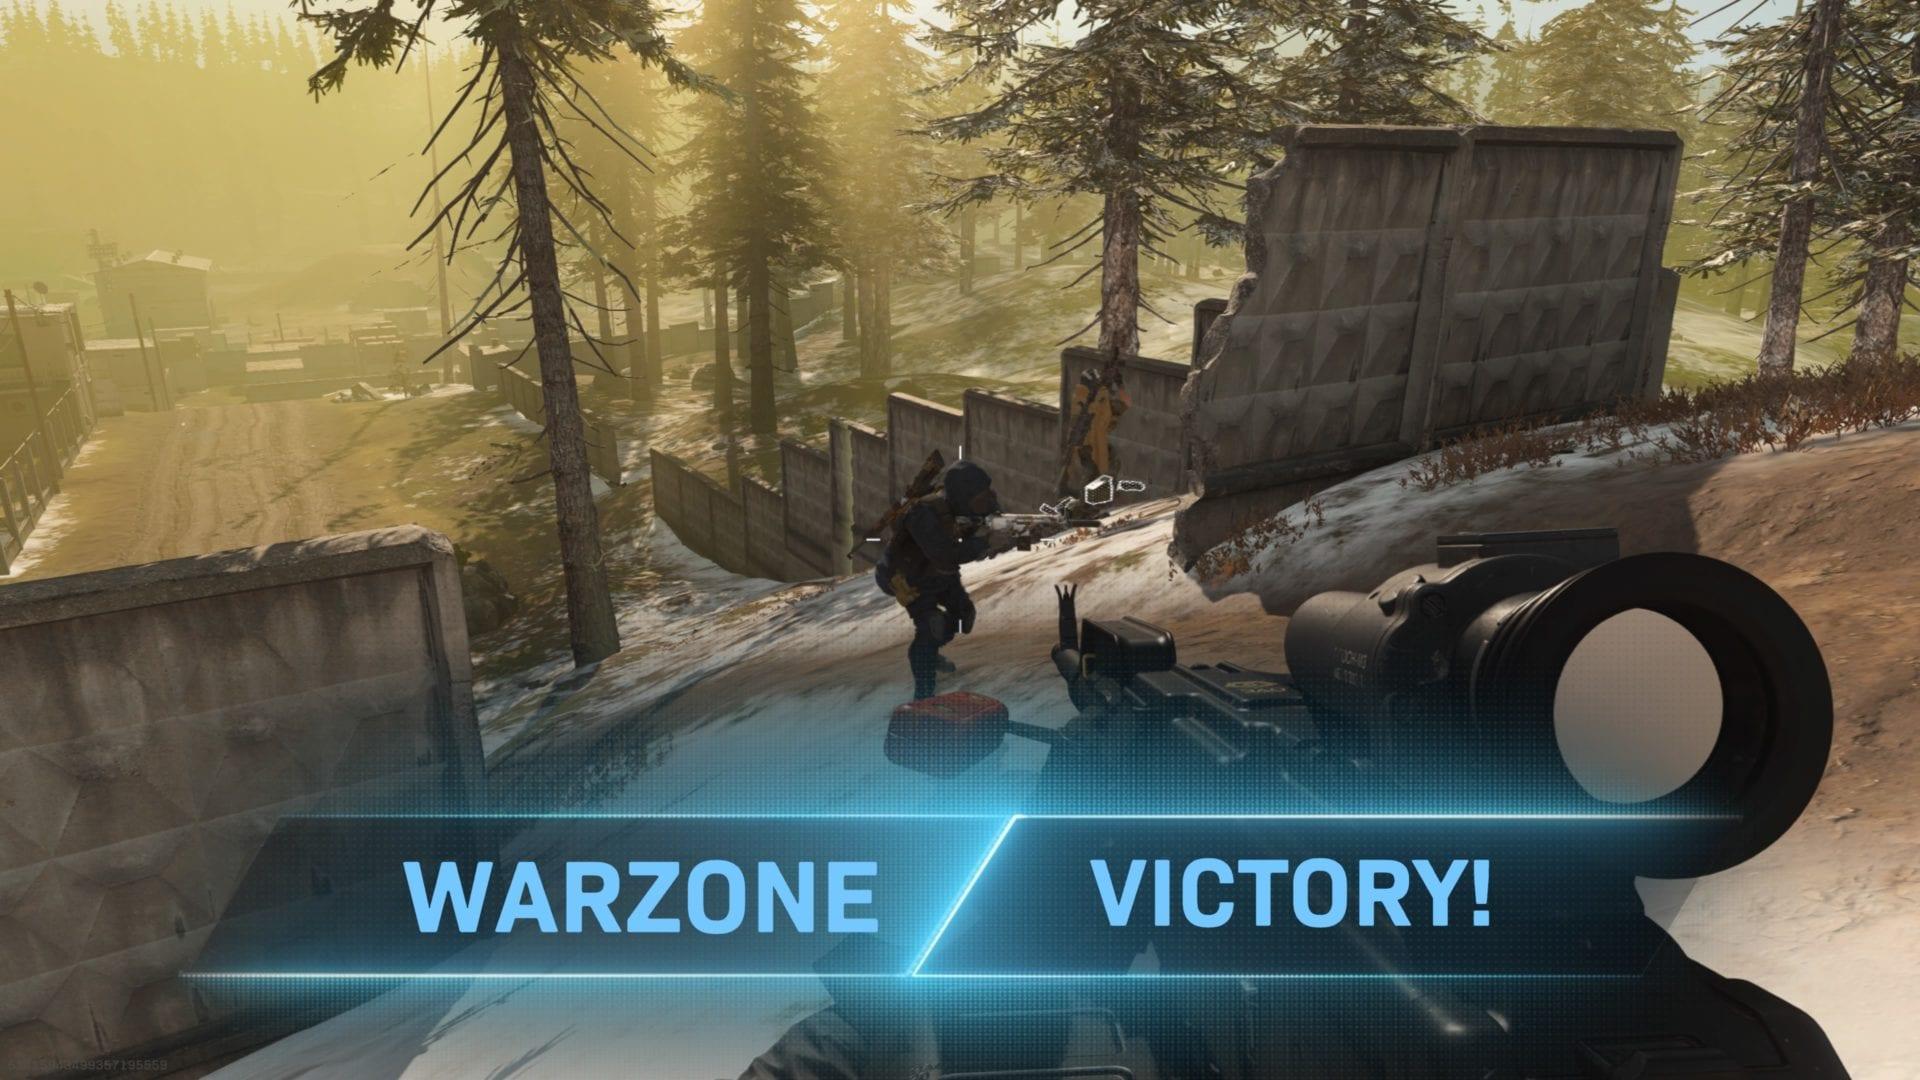 warzone, gulag